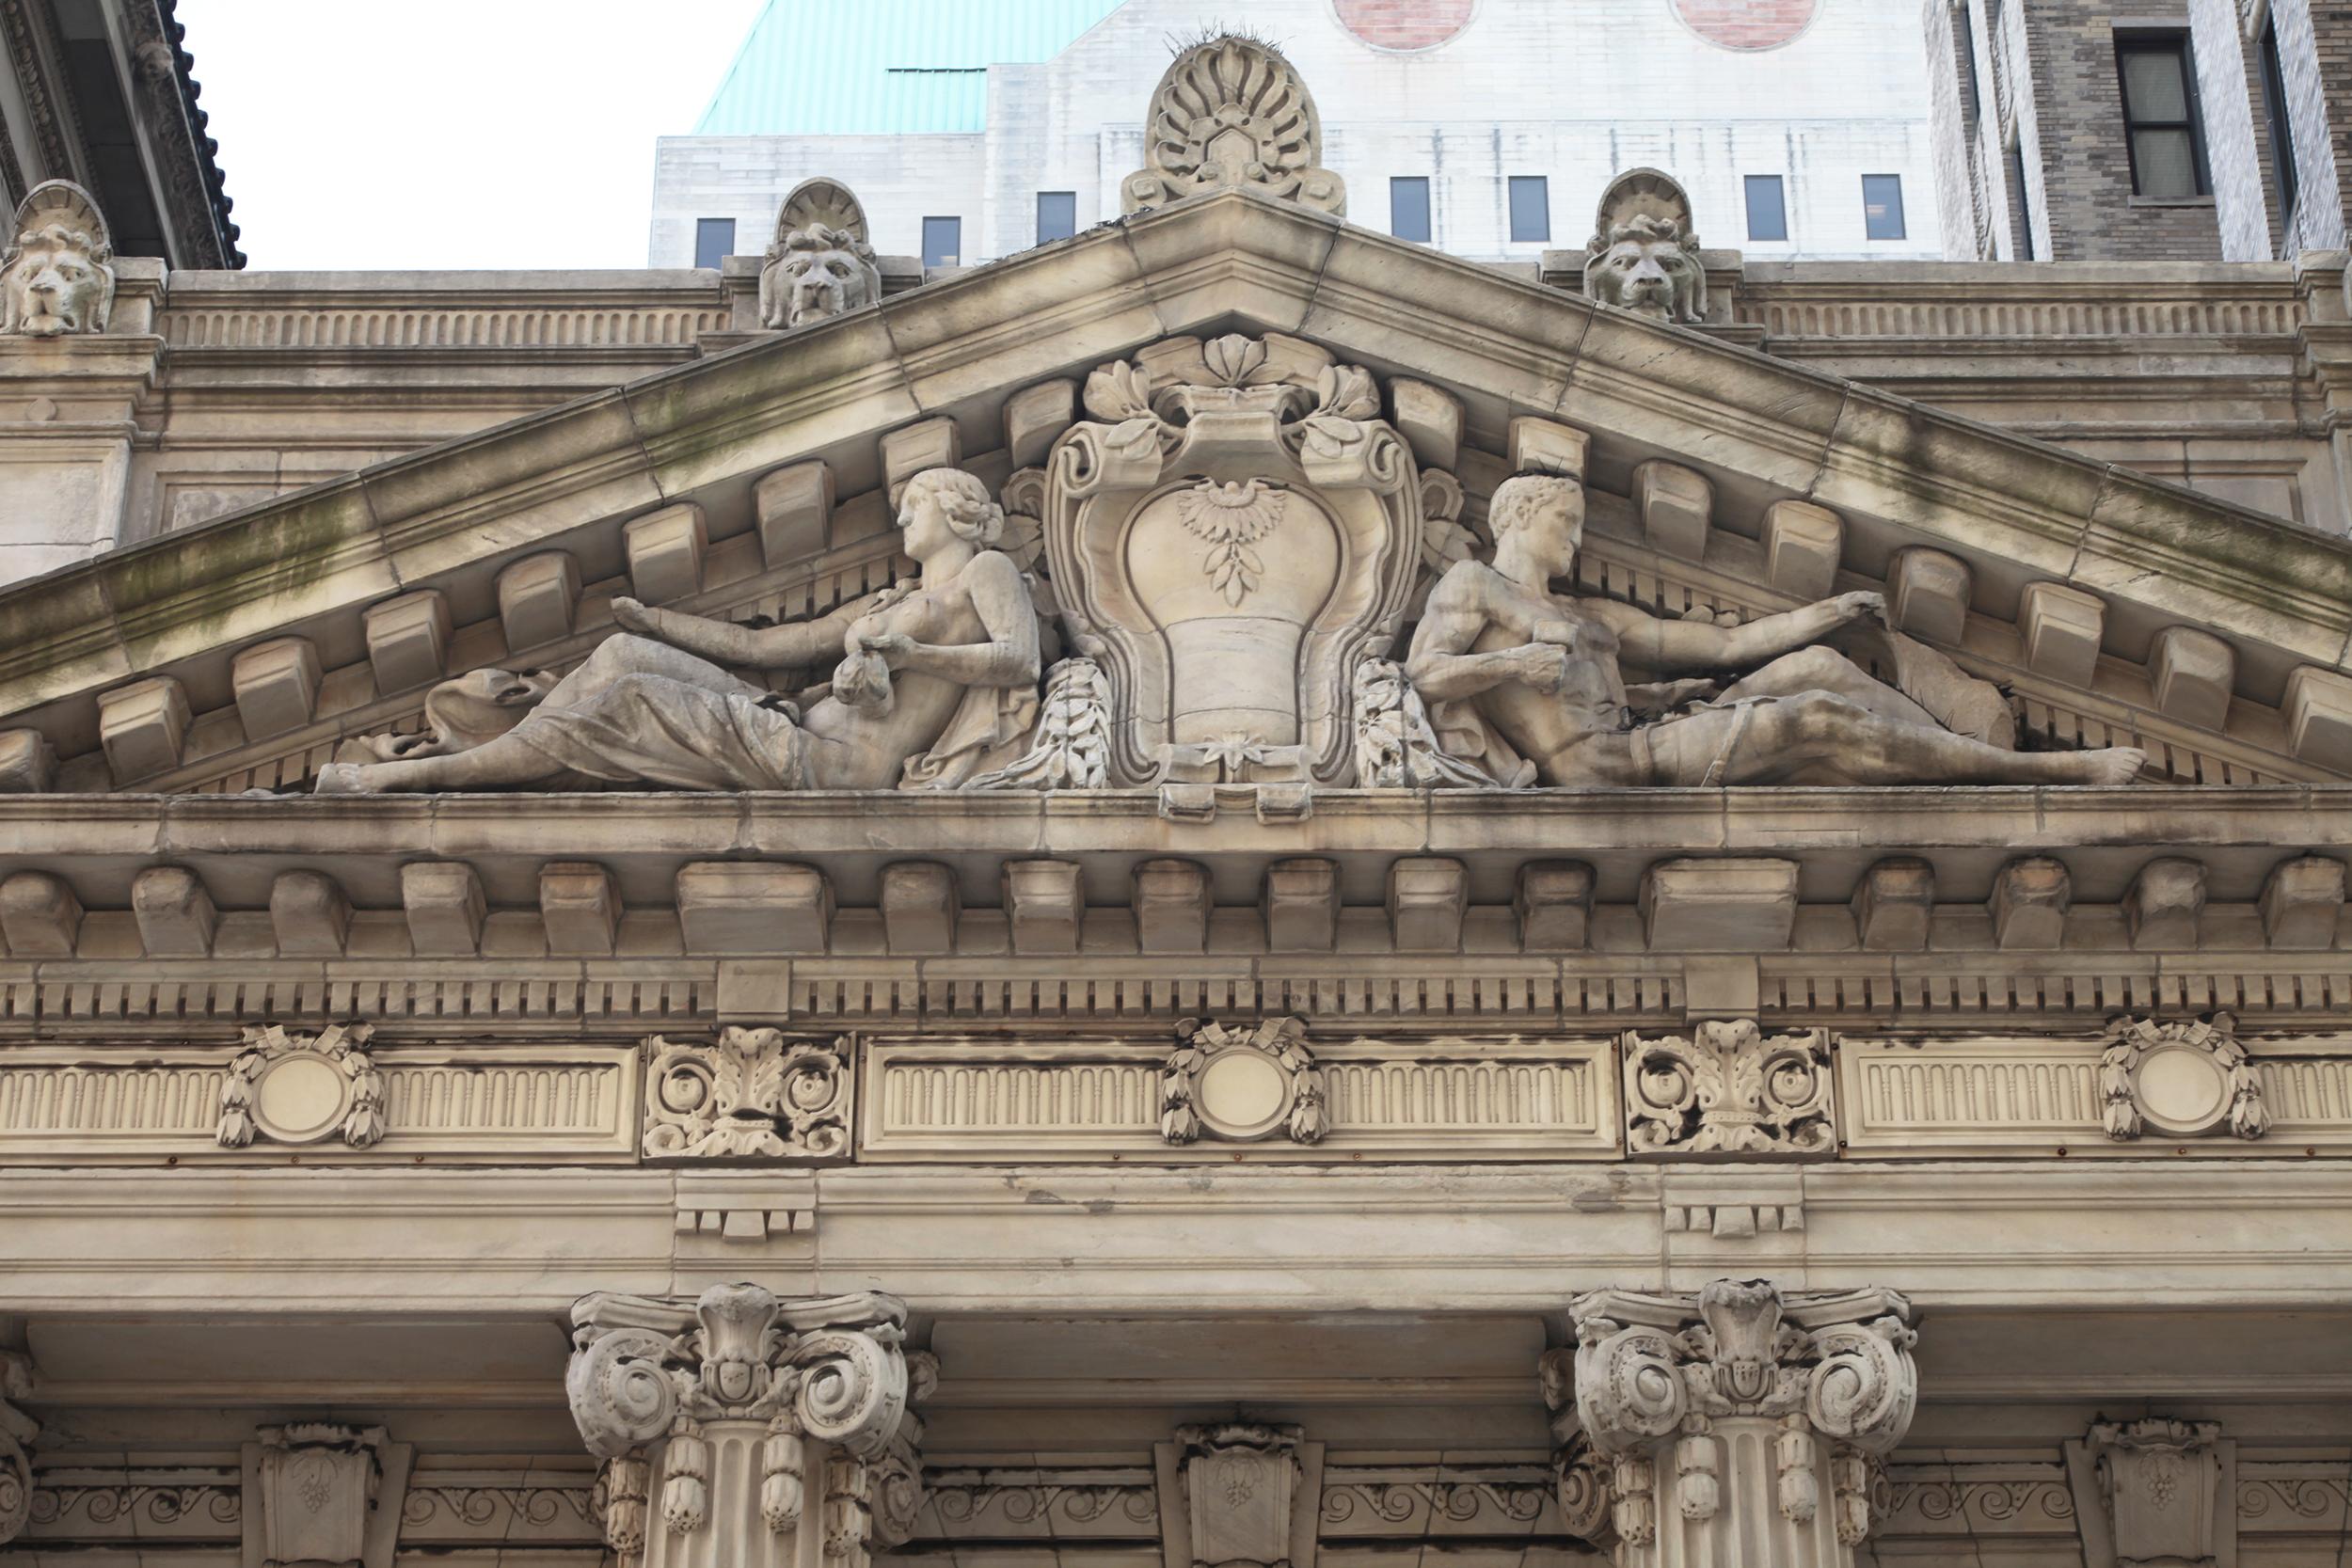 181 Montague Street, detail. LPC photo